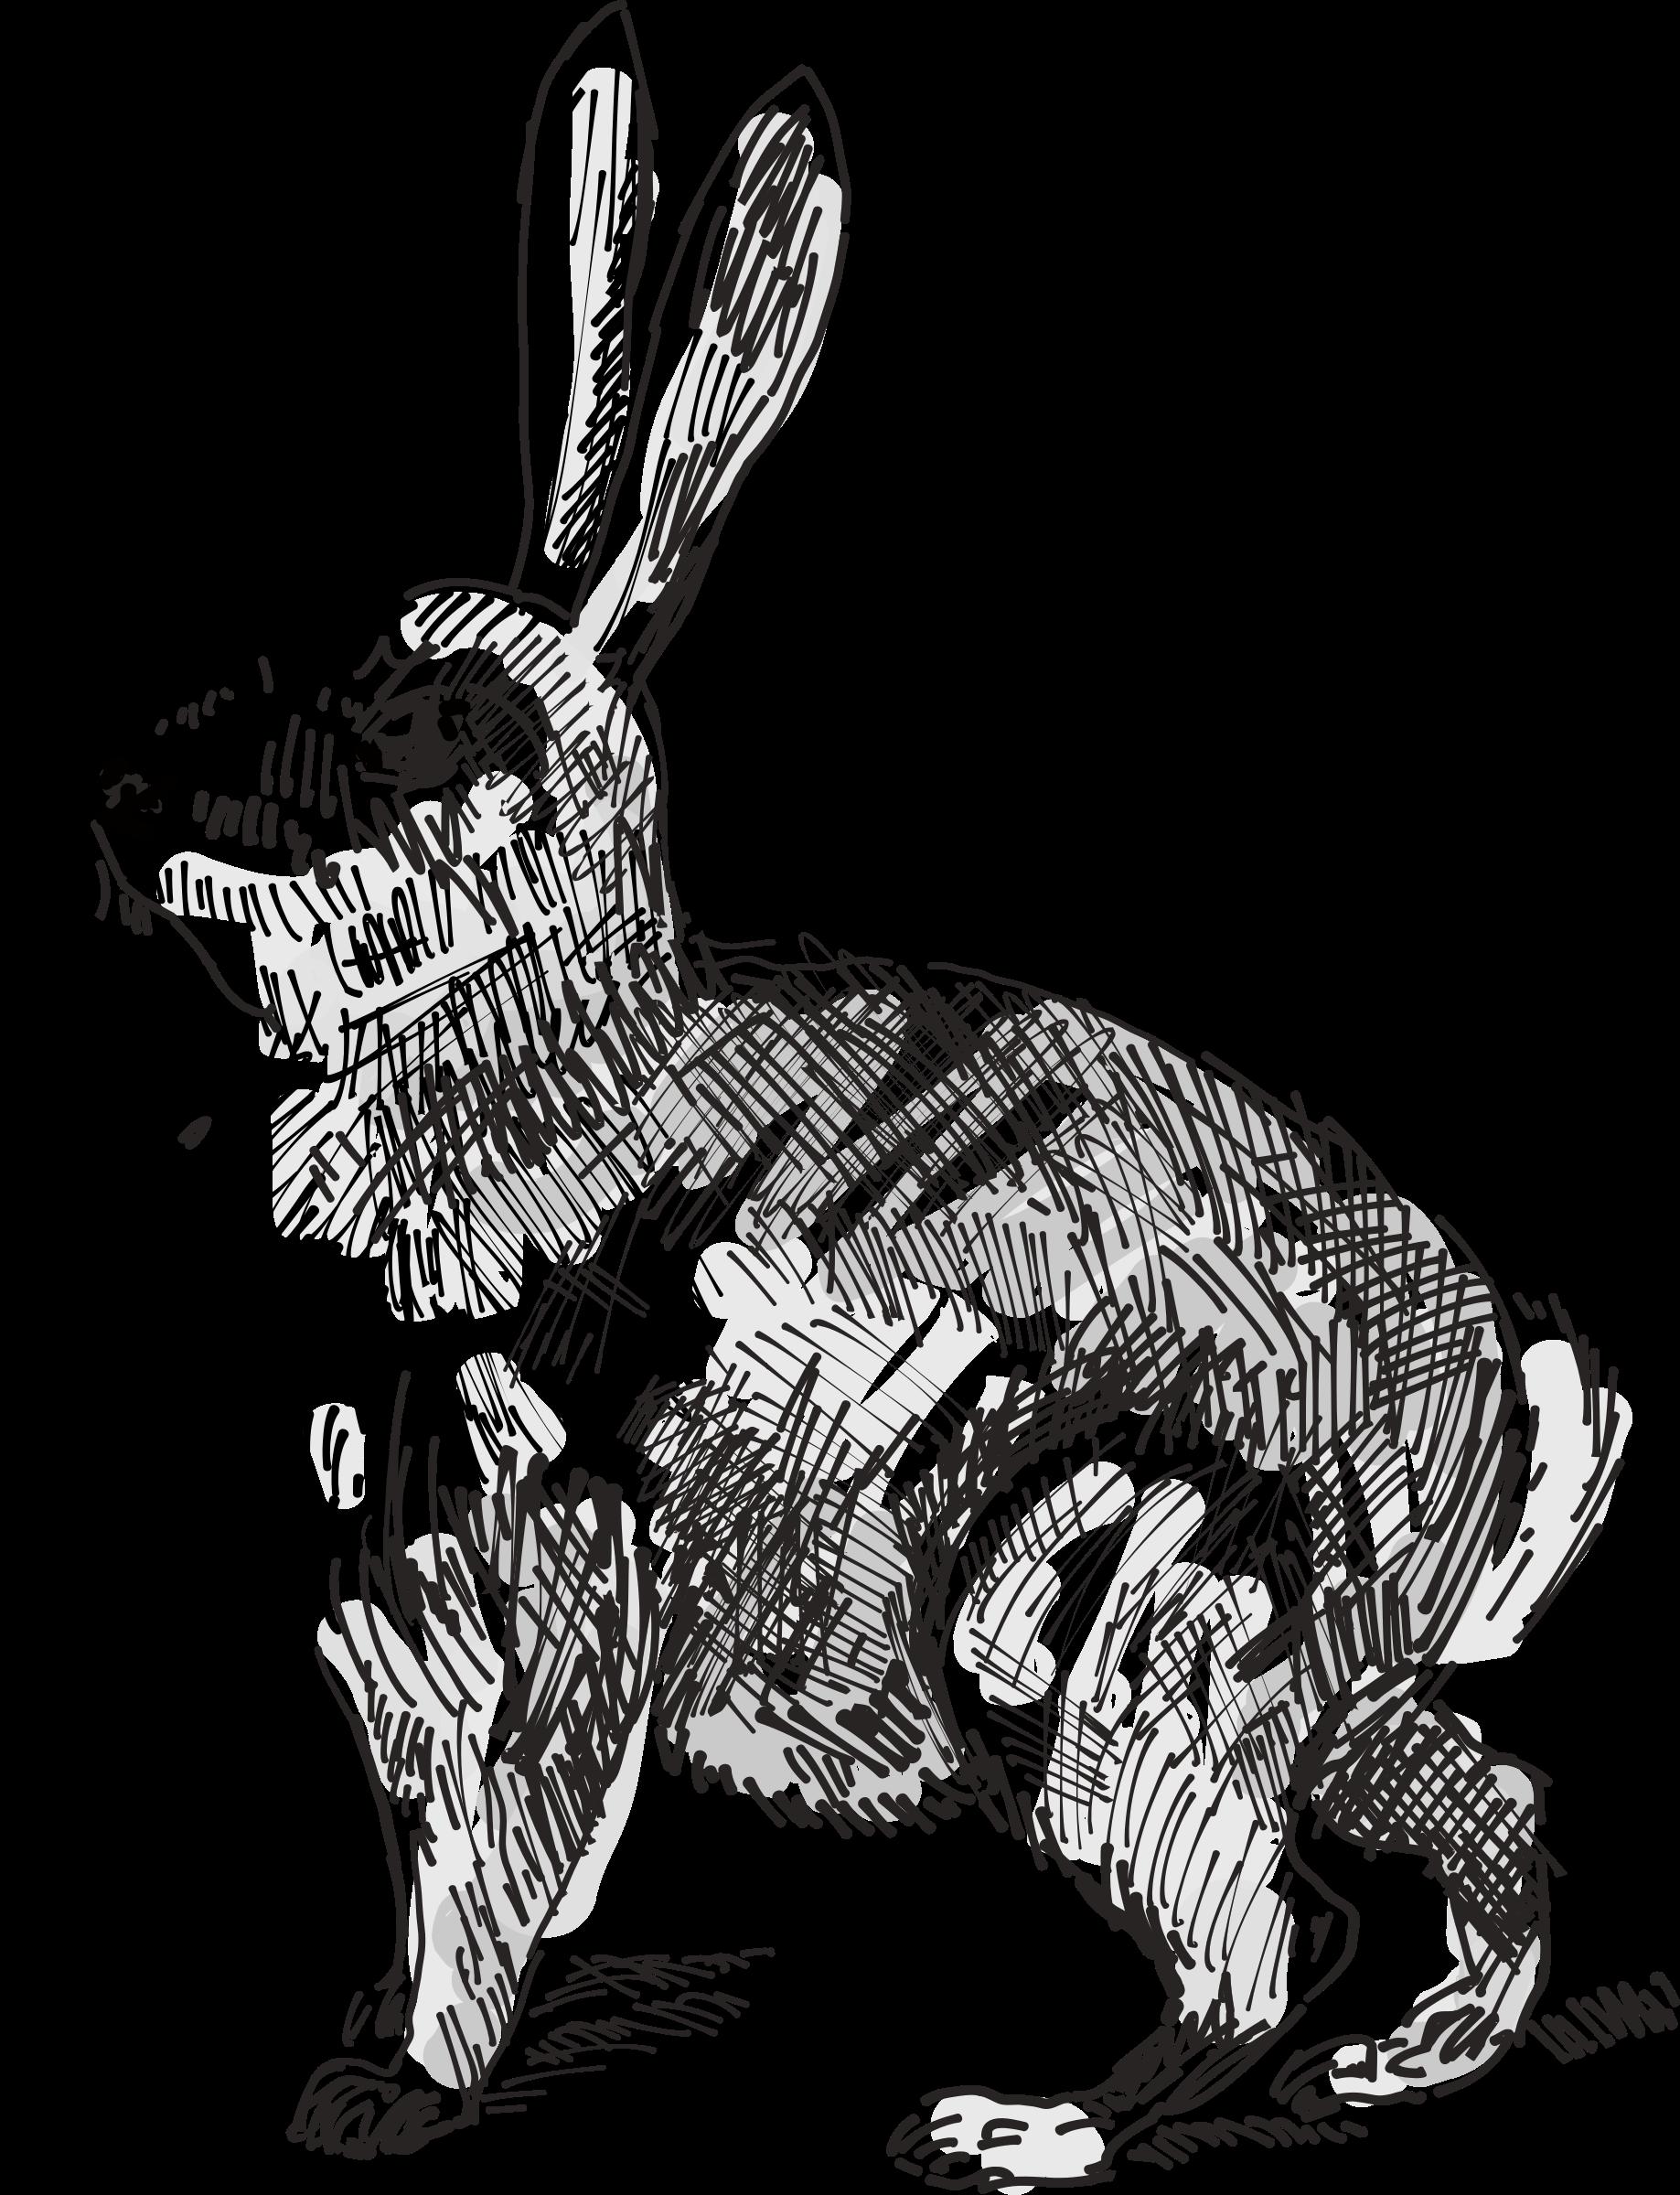 clip transparent download Bunnies clipart wild rabbit. .